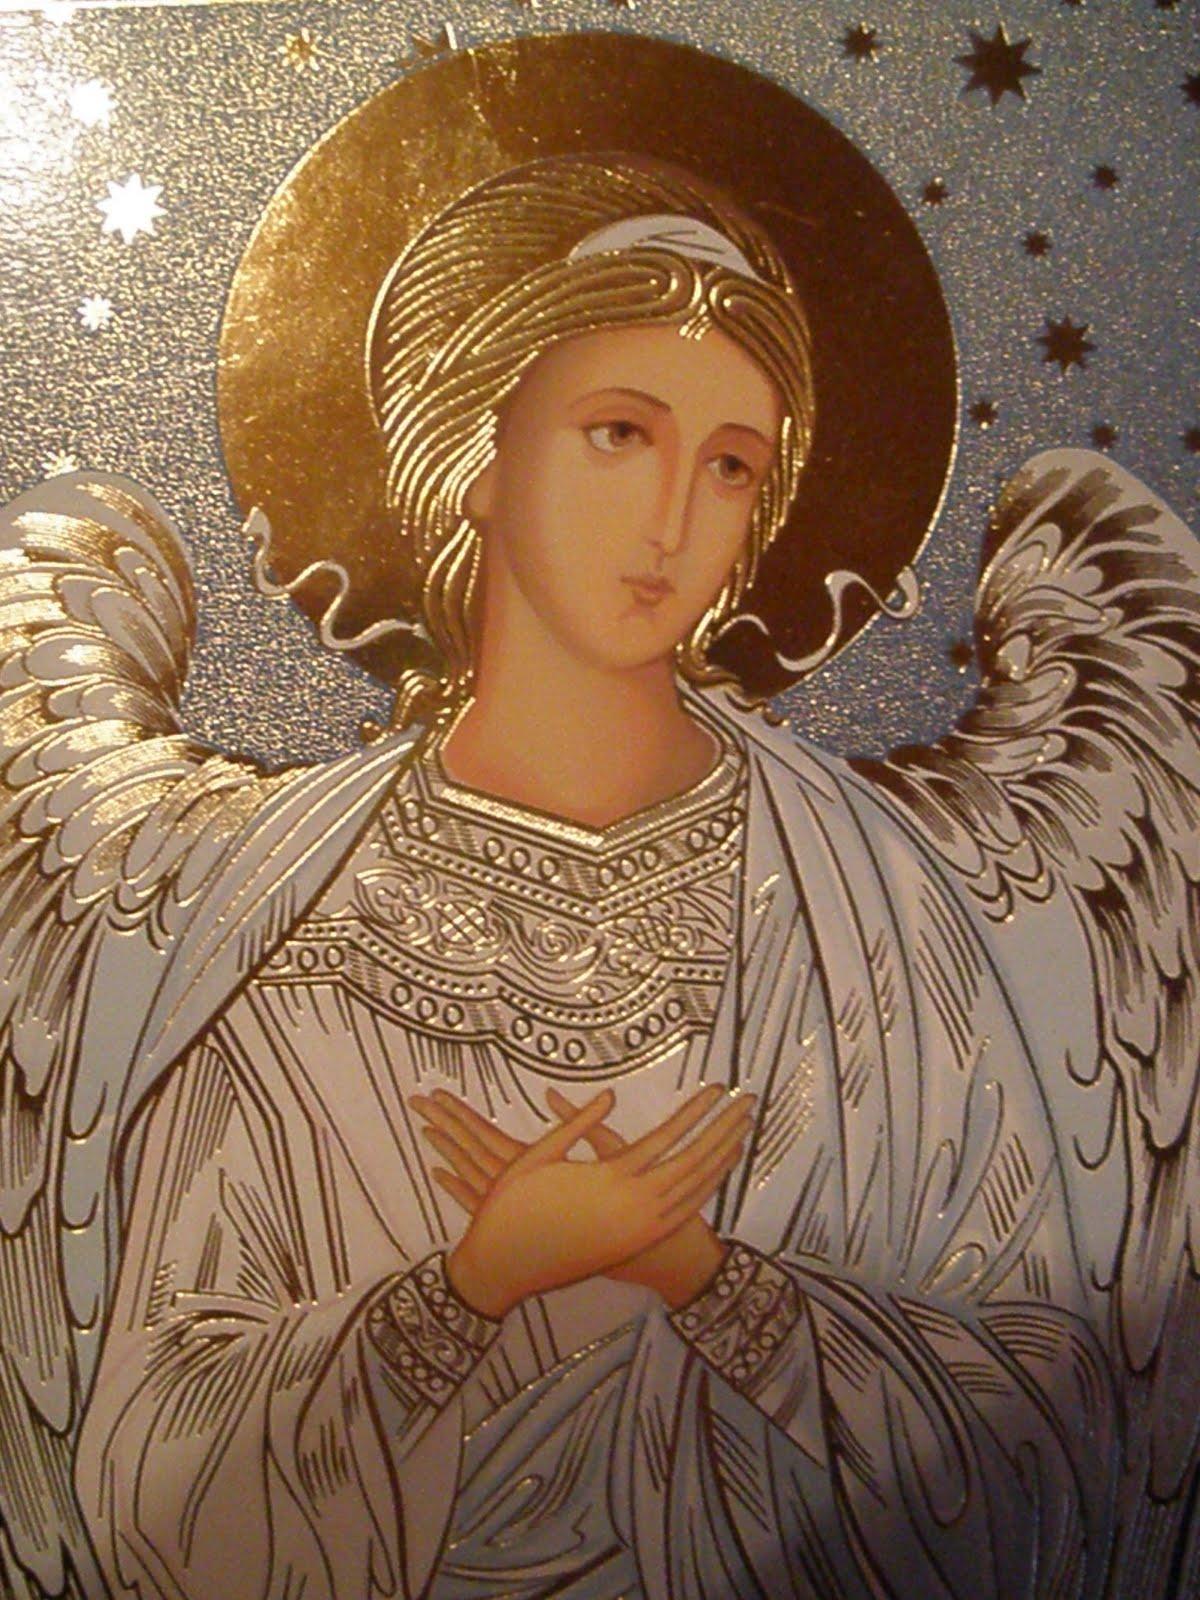 ворота хочу картинки ангела хронителя свою очередь руководствоайлендерс